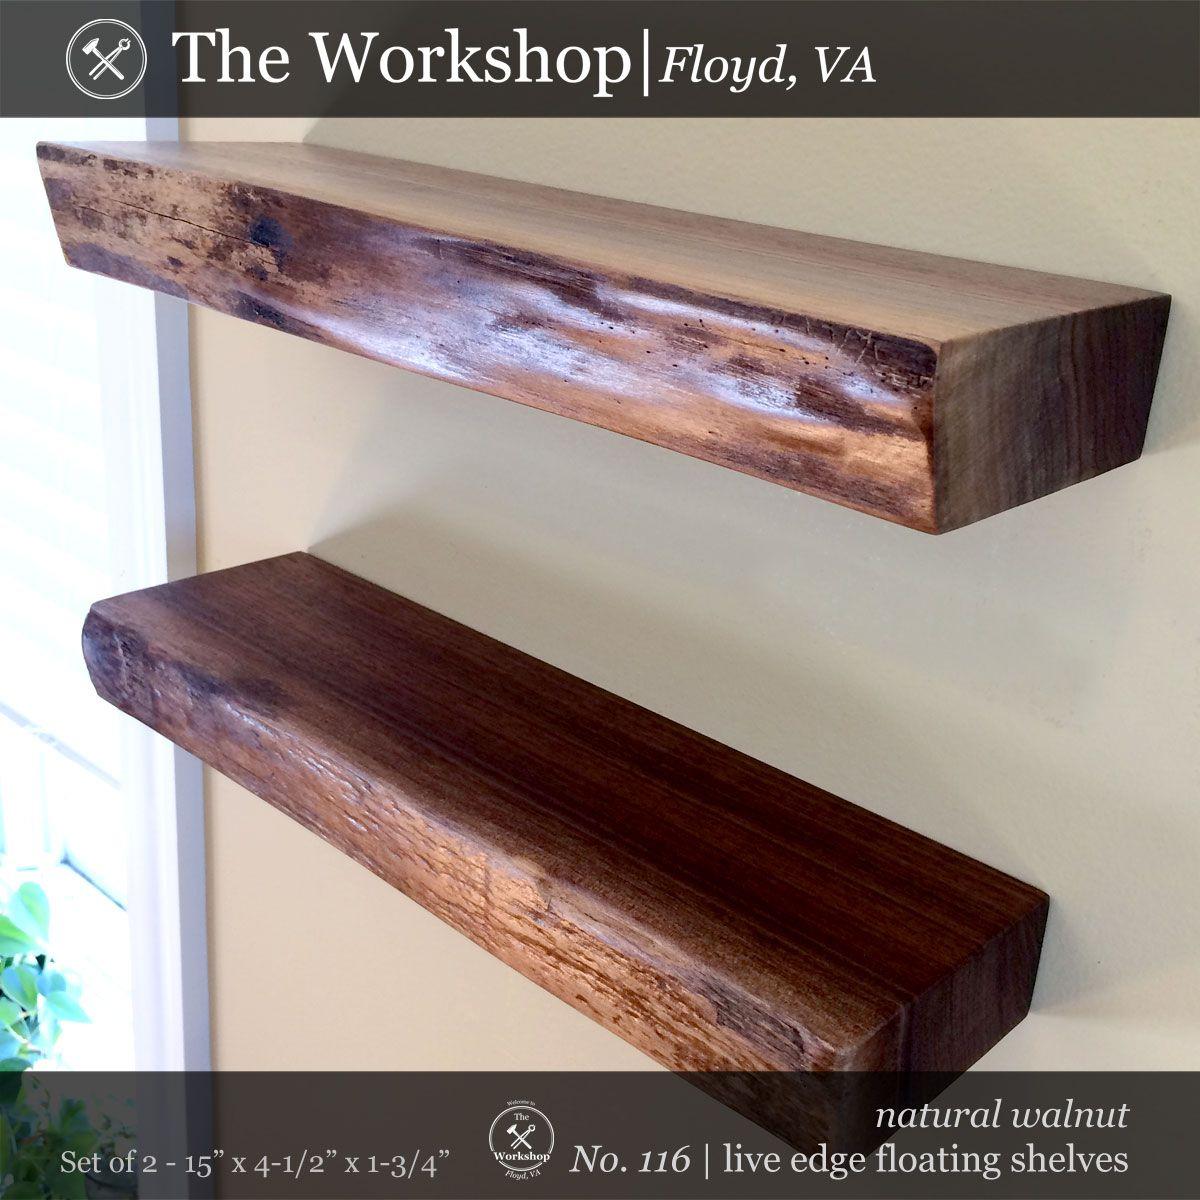 Pin By The Workshop Floyd Va On Floating Shelves Pinterest 1 Set Of 2 Live Edge Walnut No